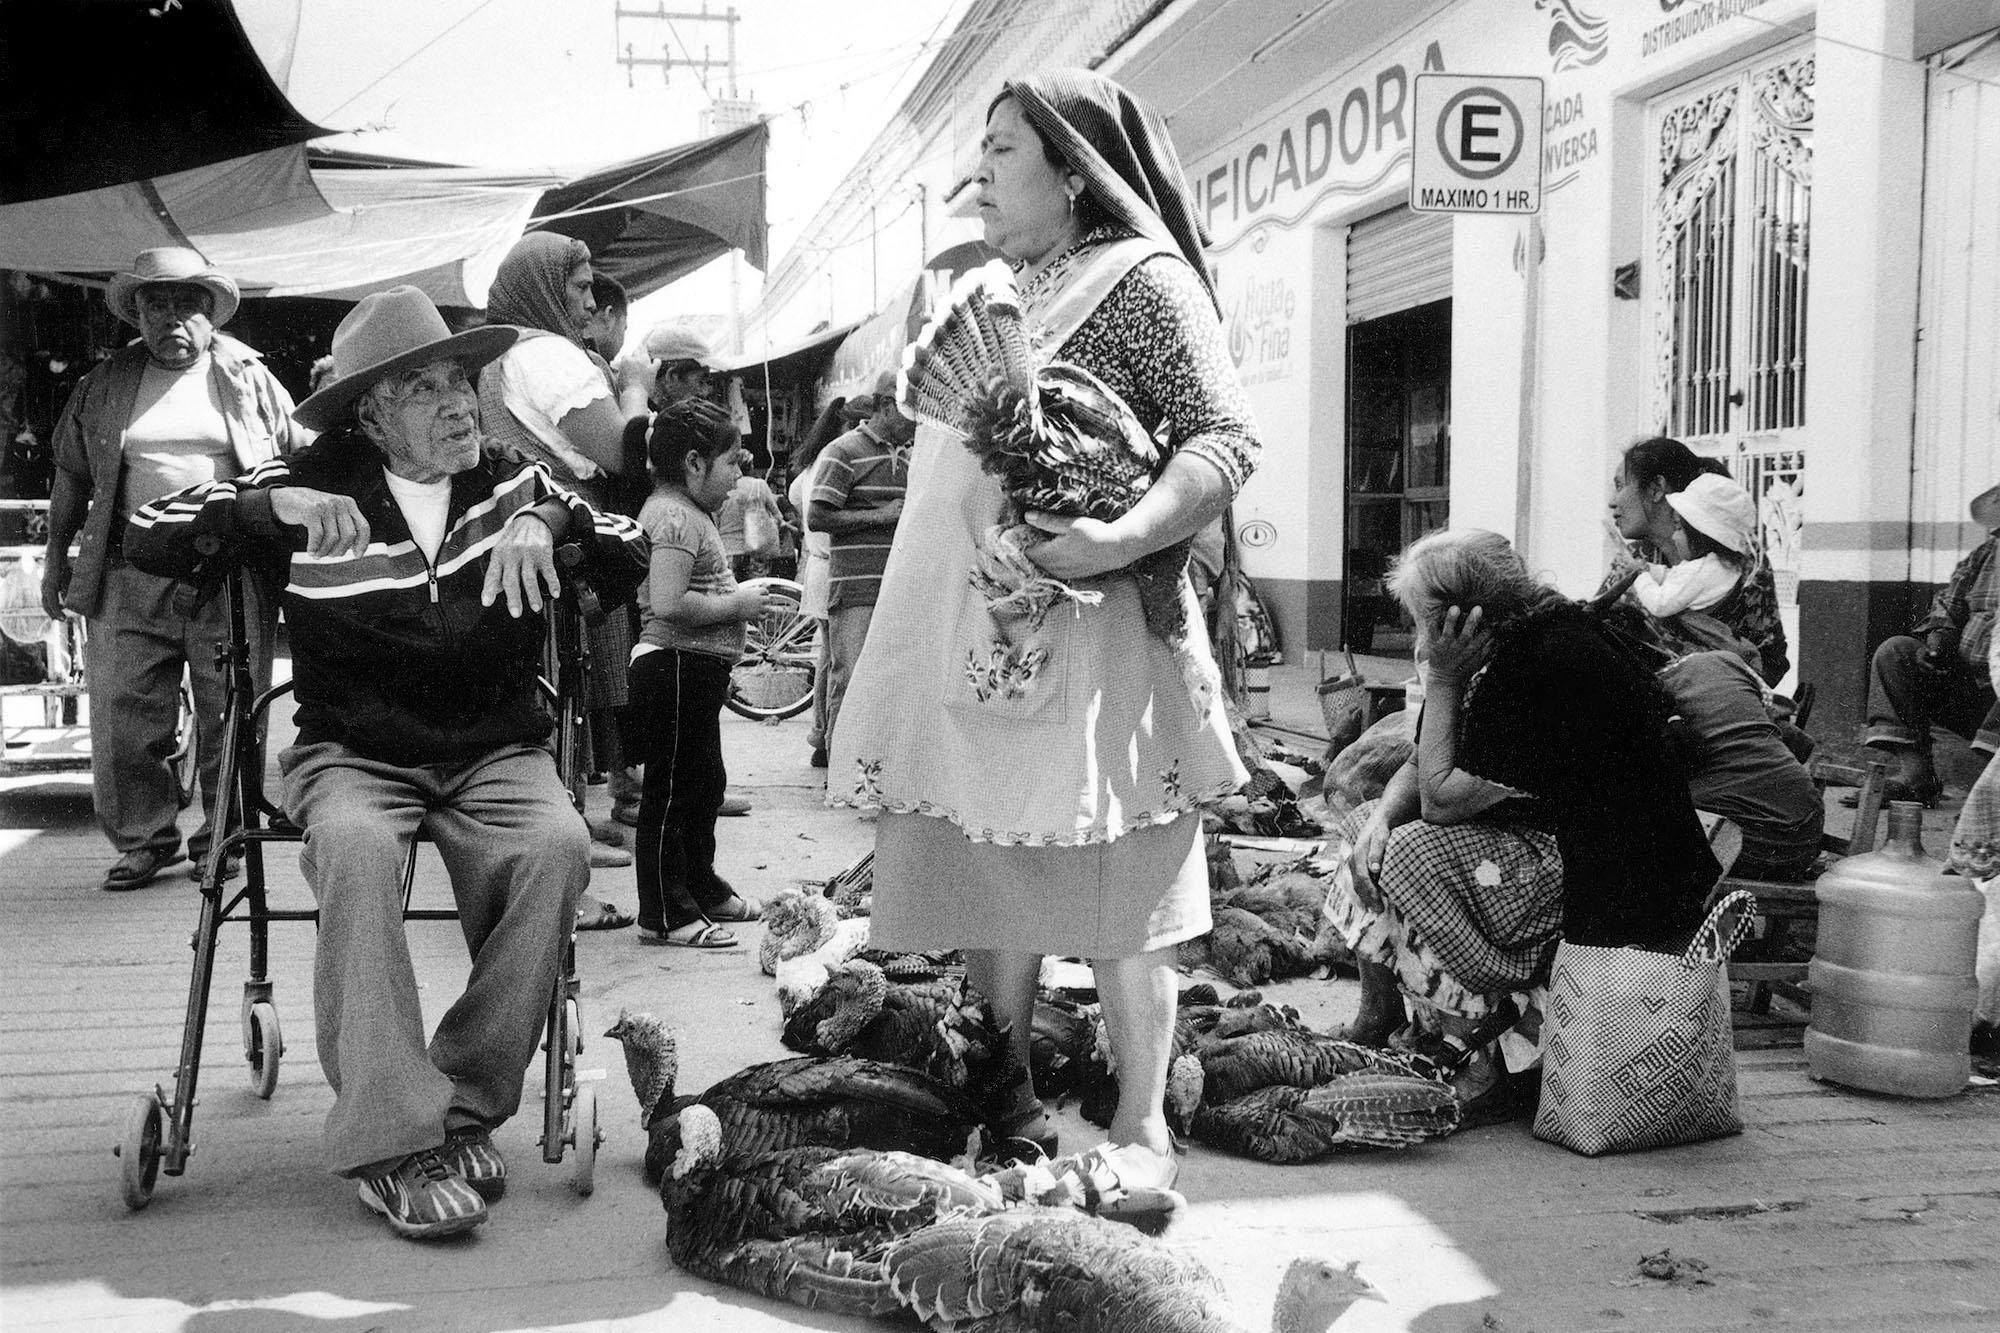 Tlacolula Market, Oaxaca, 2017